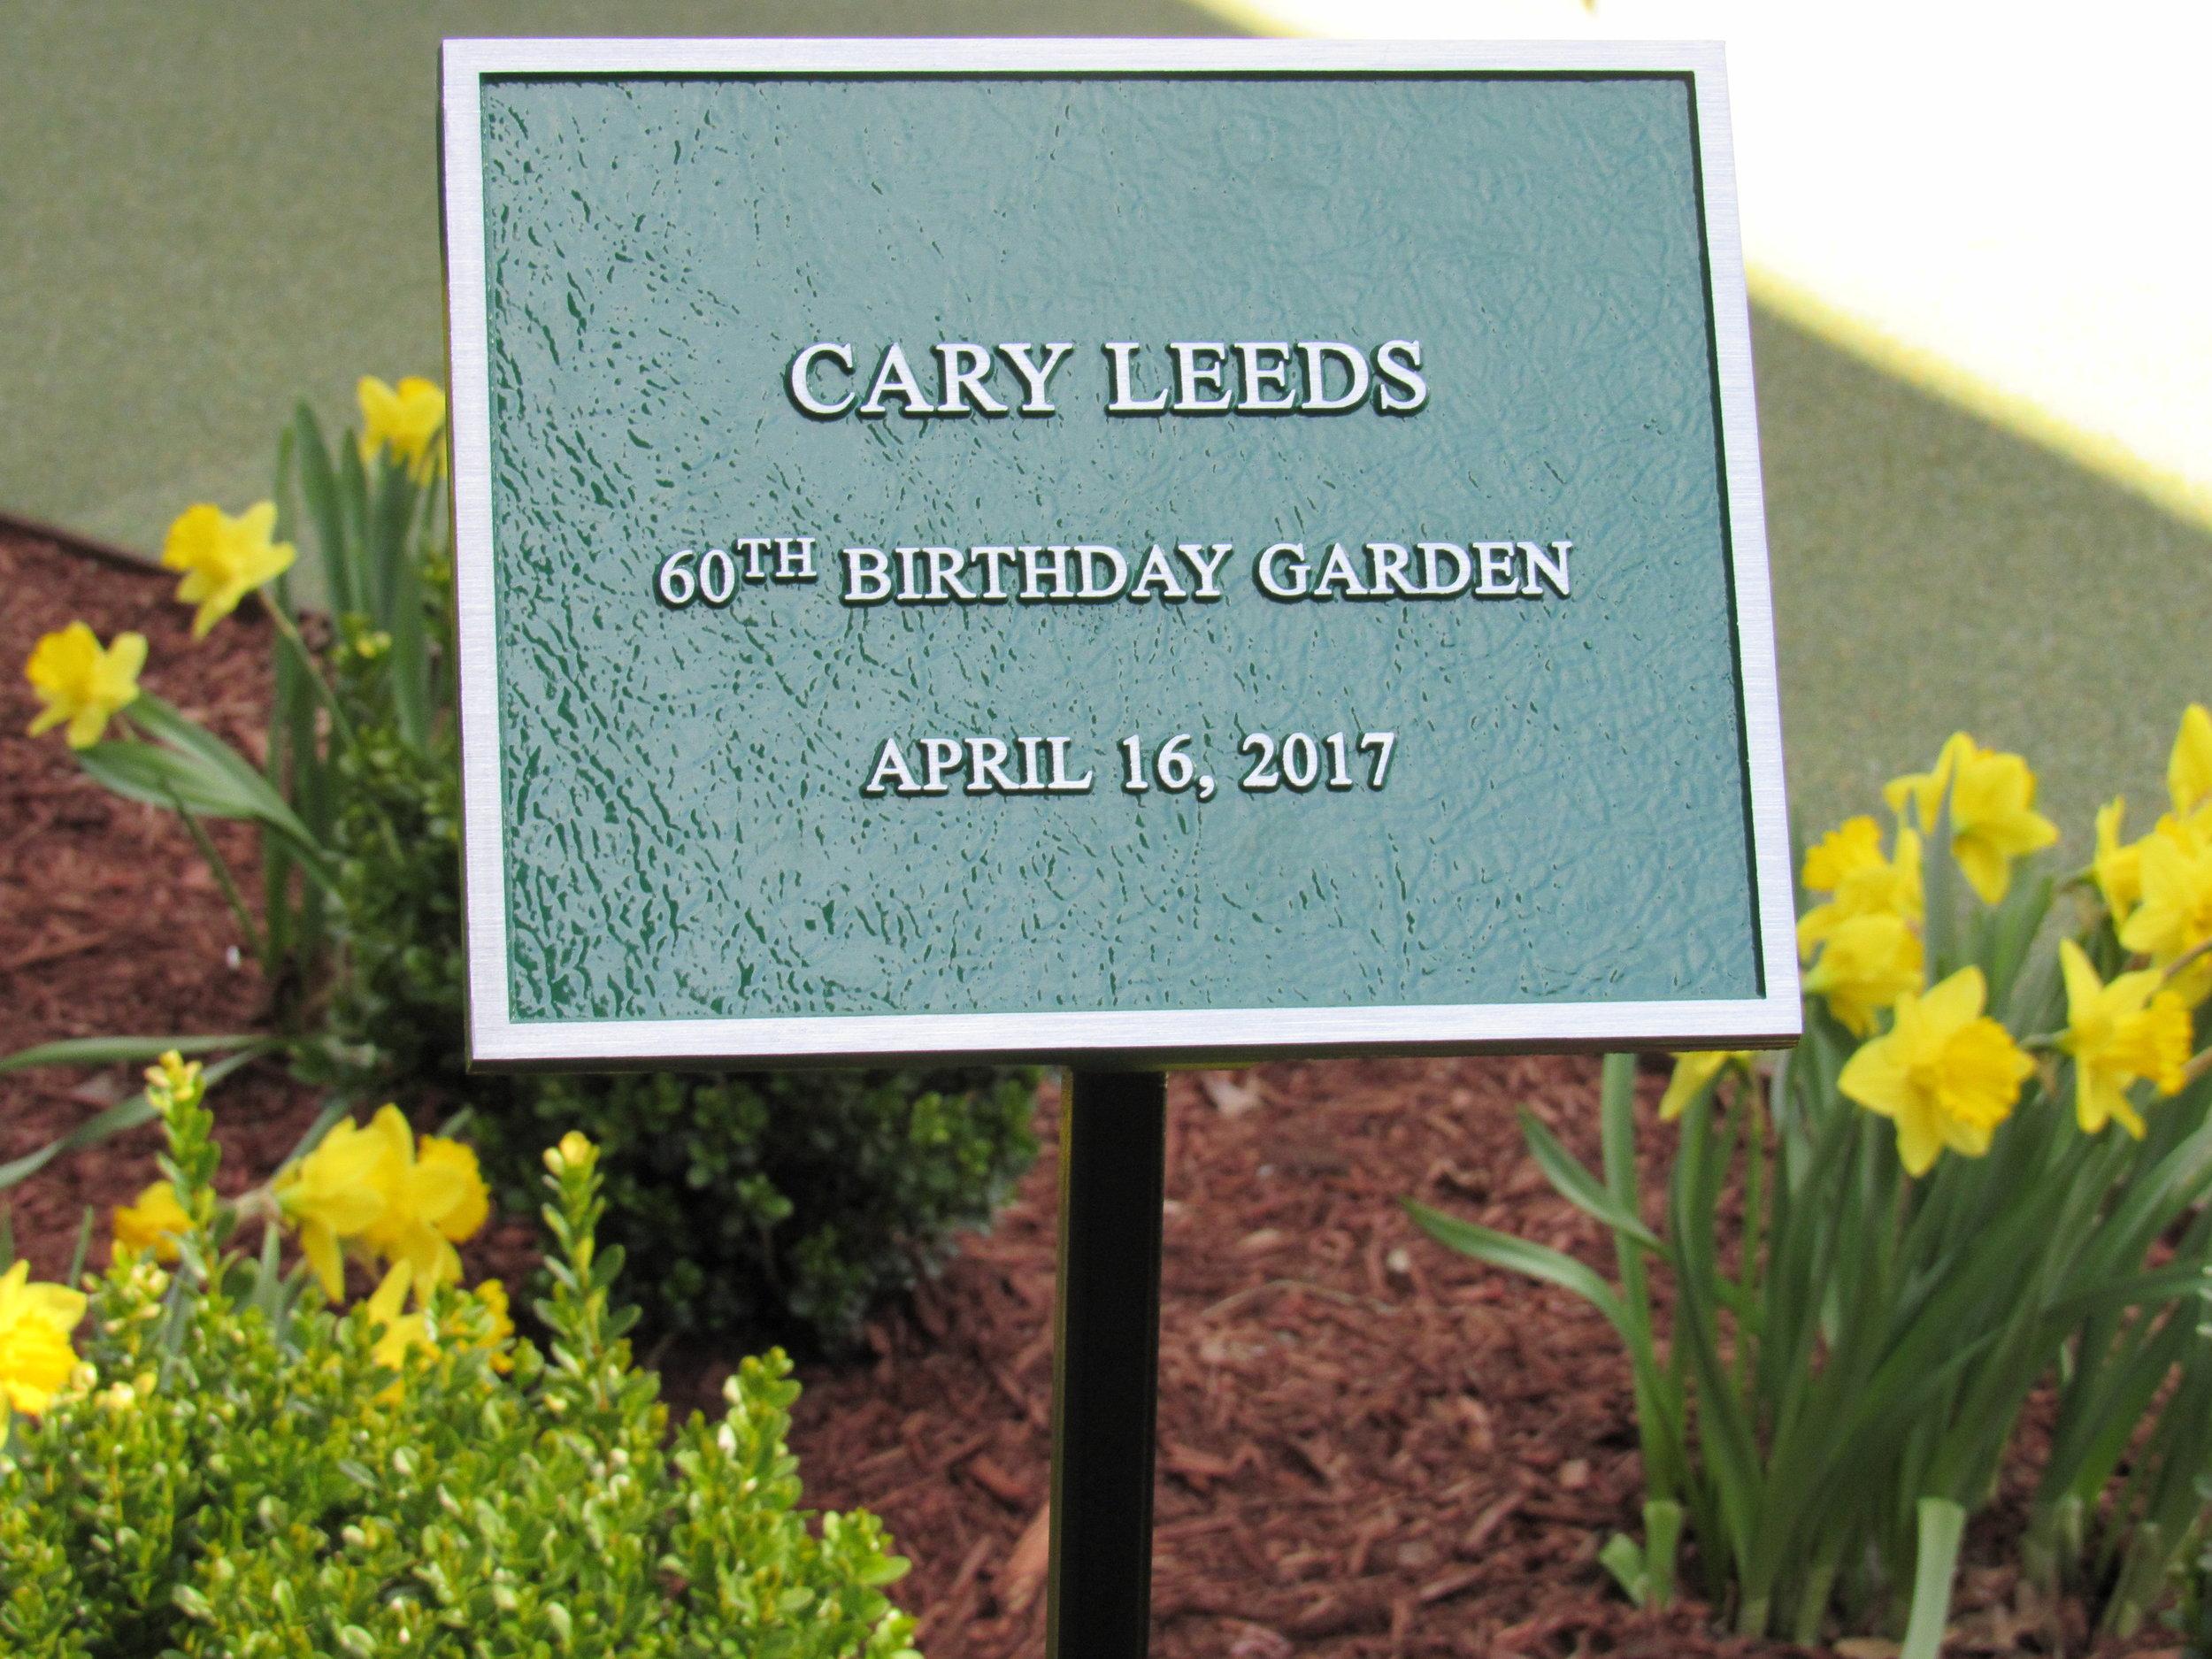 Cary Leeds 60th Garden Sign.JPG